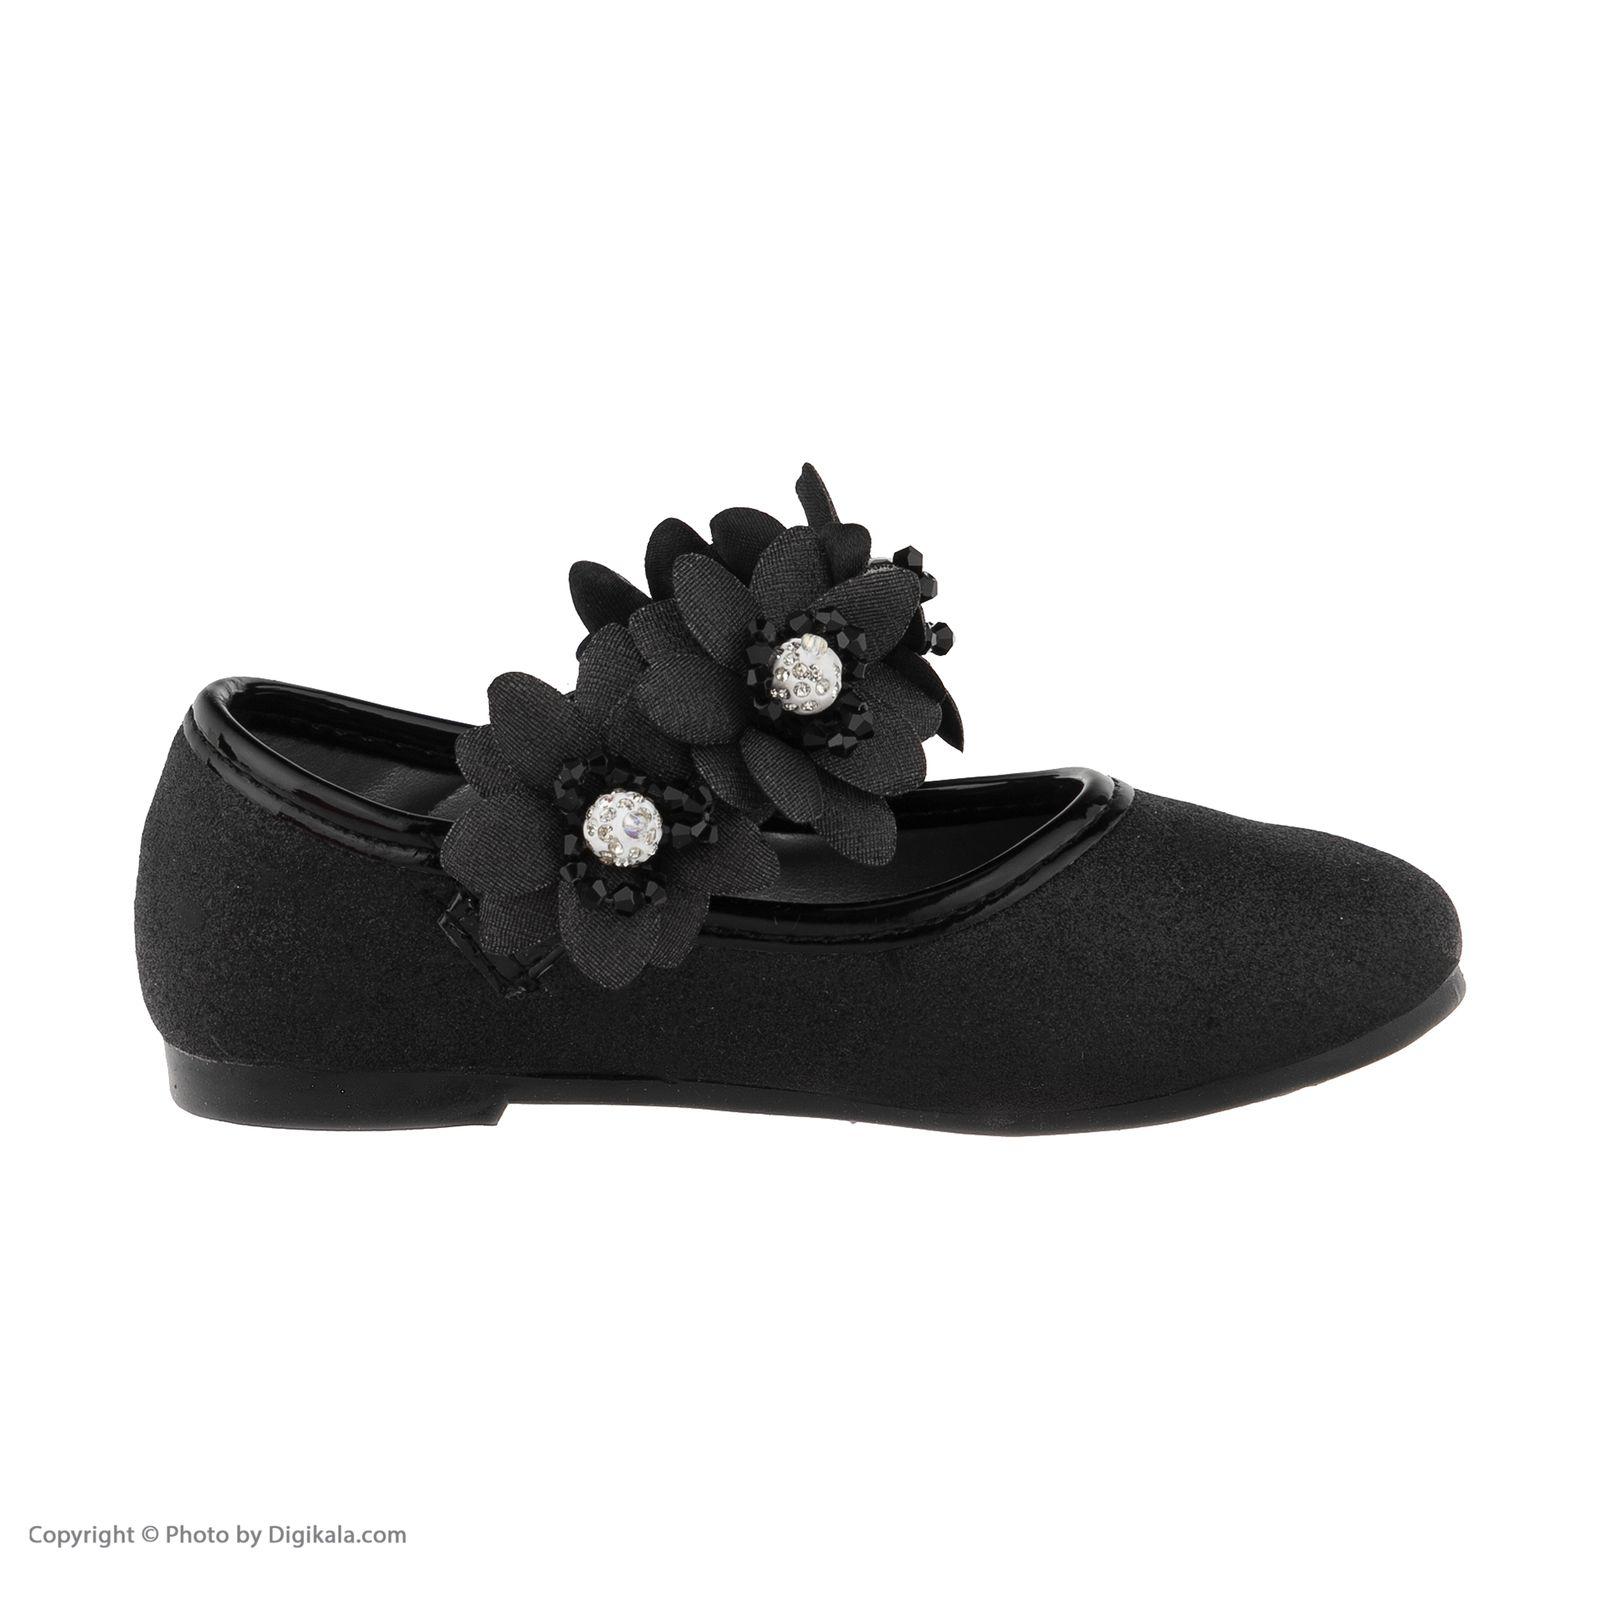 کفش دخترانه کد pa-1036 -  - 3